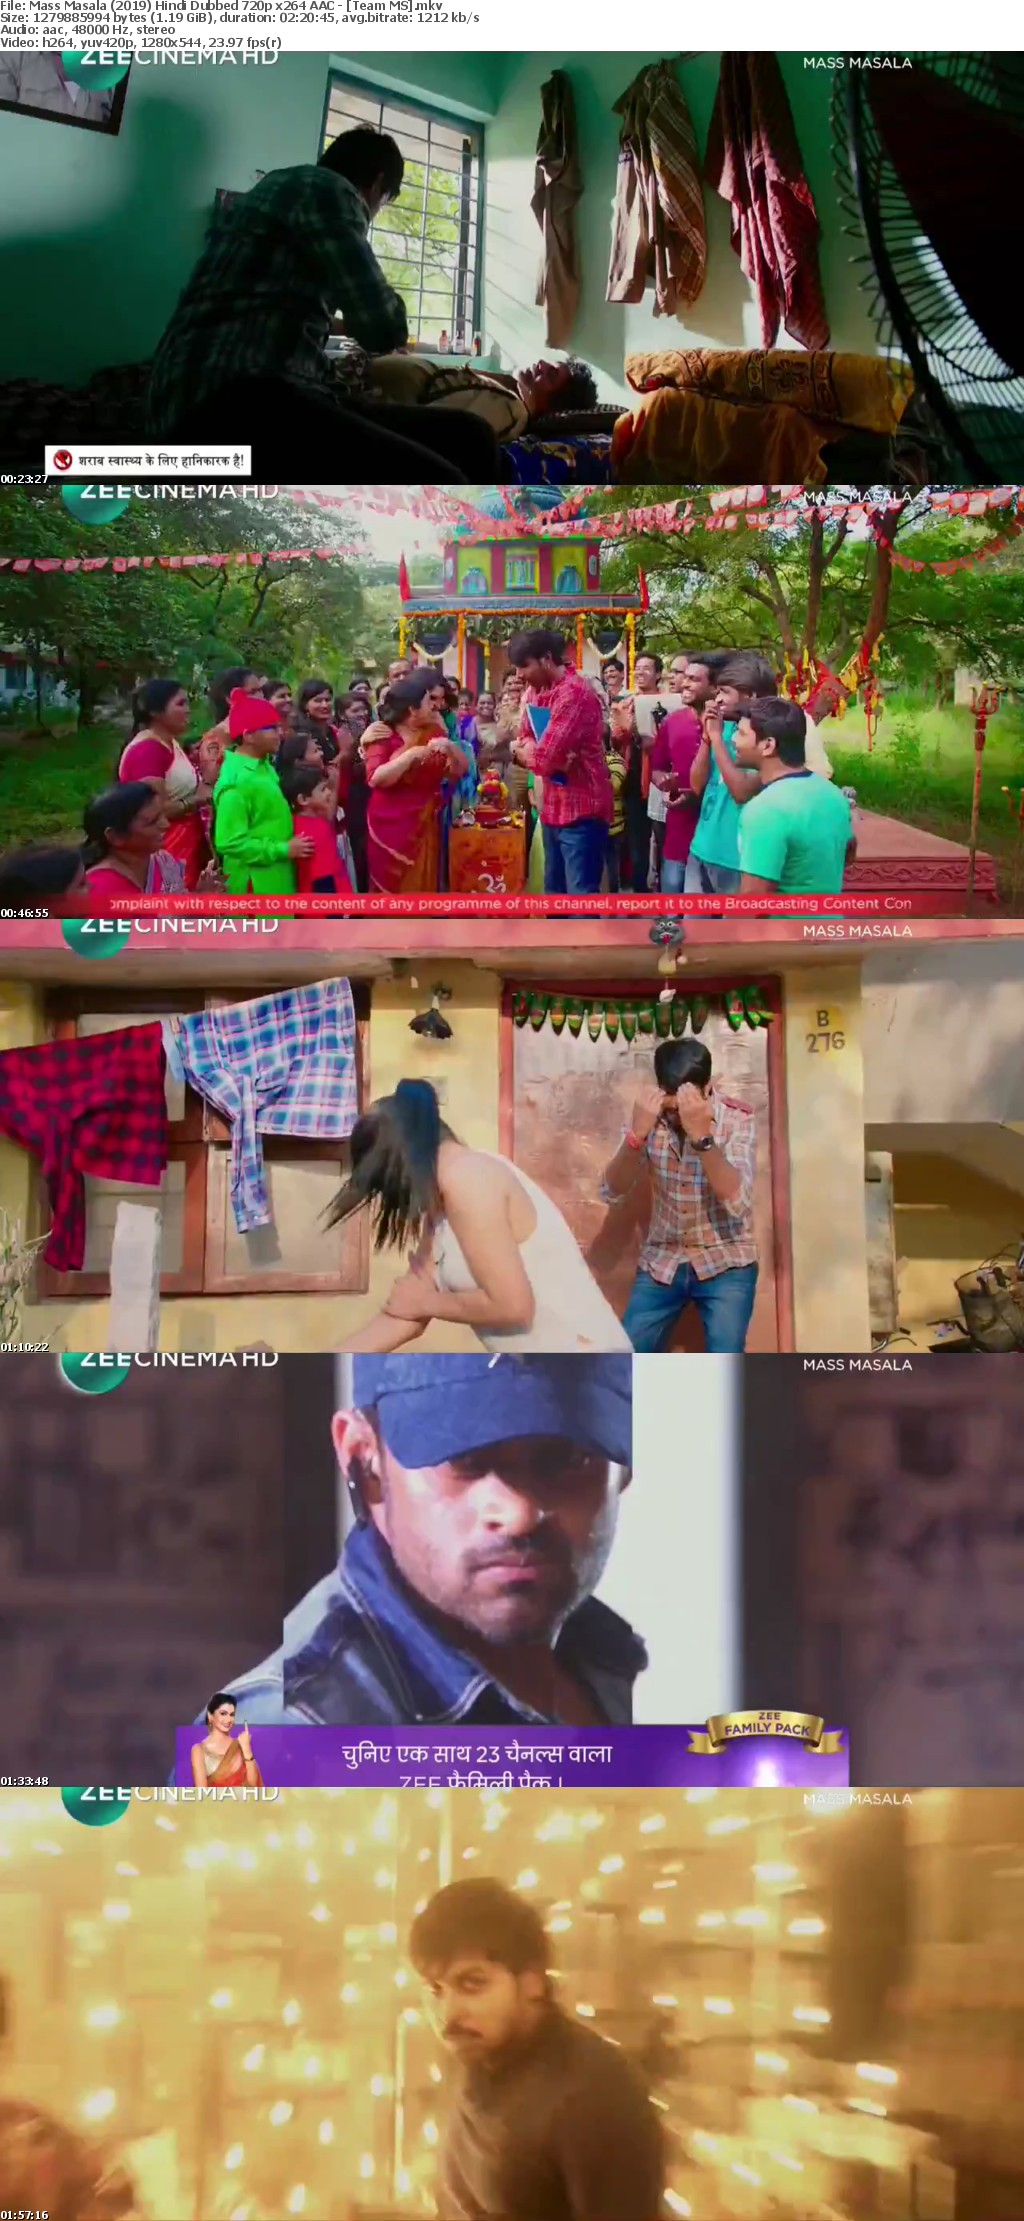 Mass Masala 2019 Hindi Dubbed HDTVRip 720p x264 AAC - [Team MS]